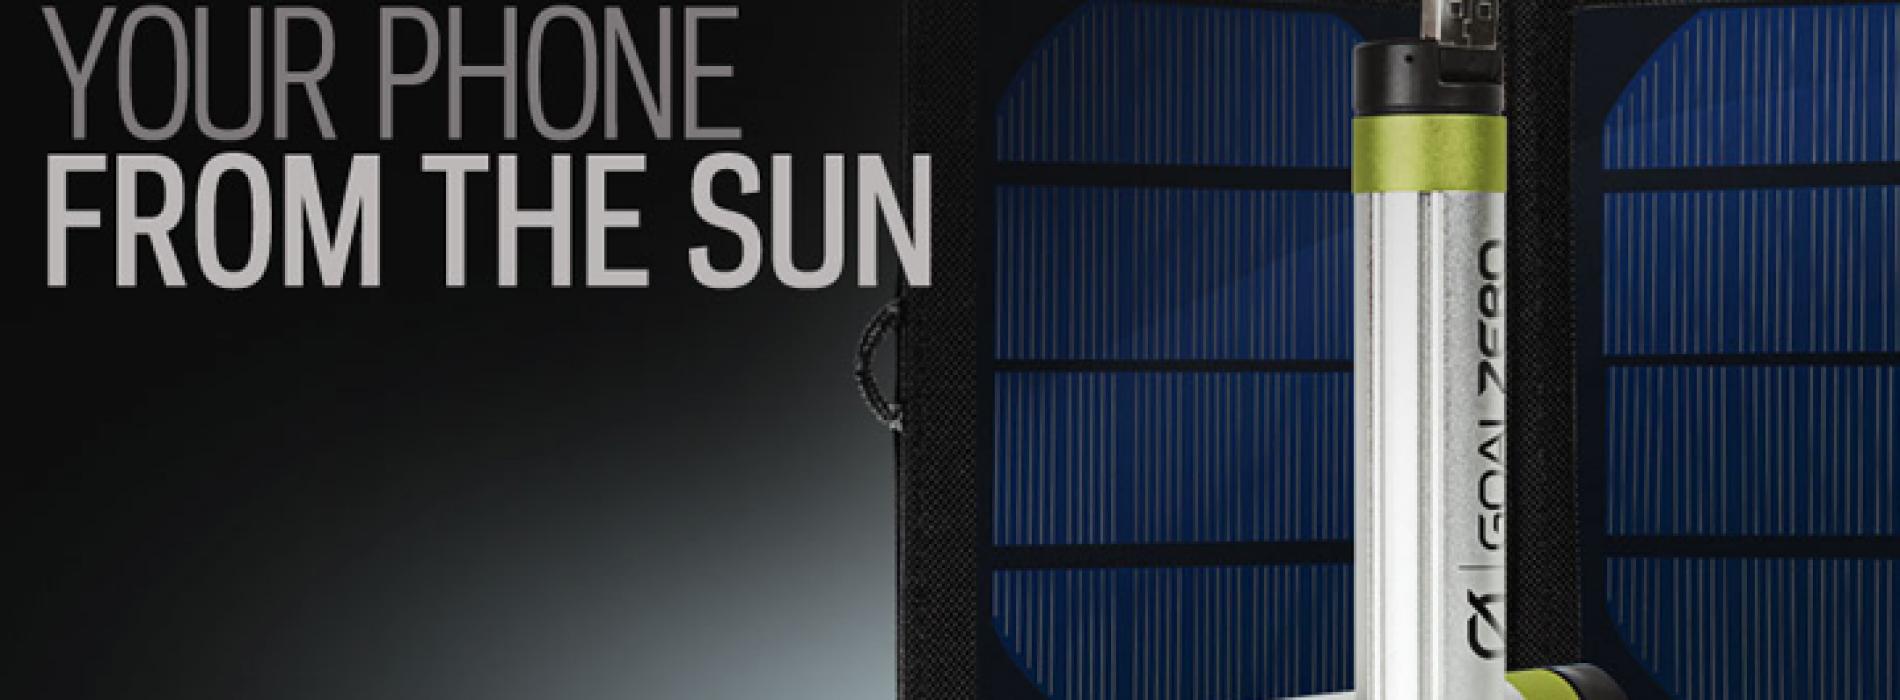 Goal Zero debuts Switch 8 Solar Recharging Kit